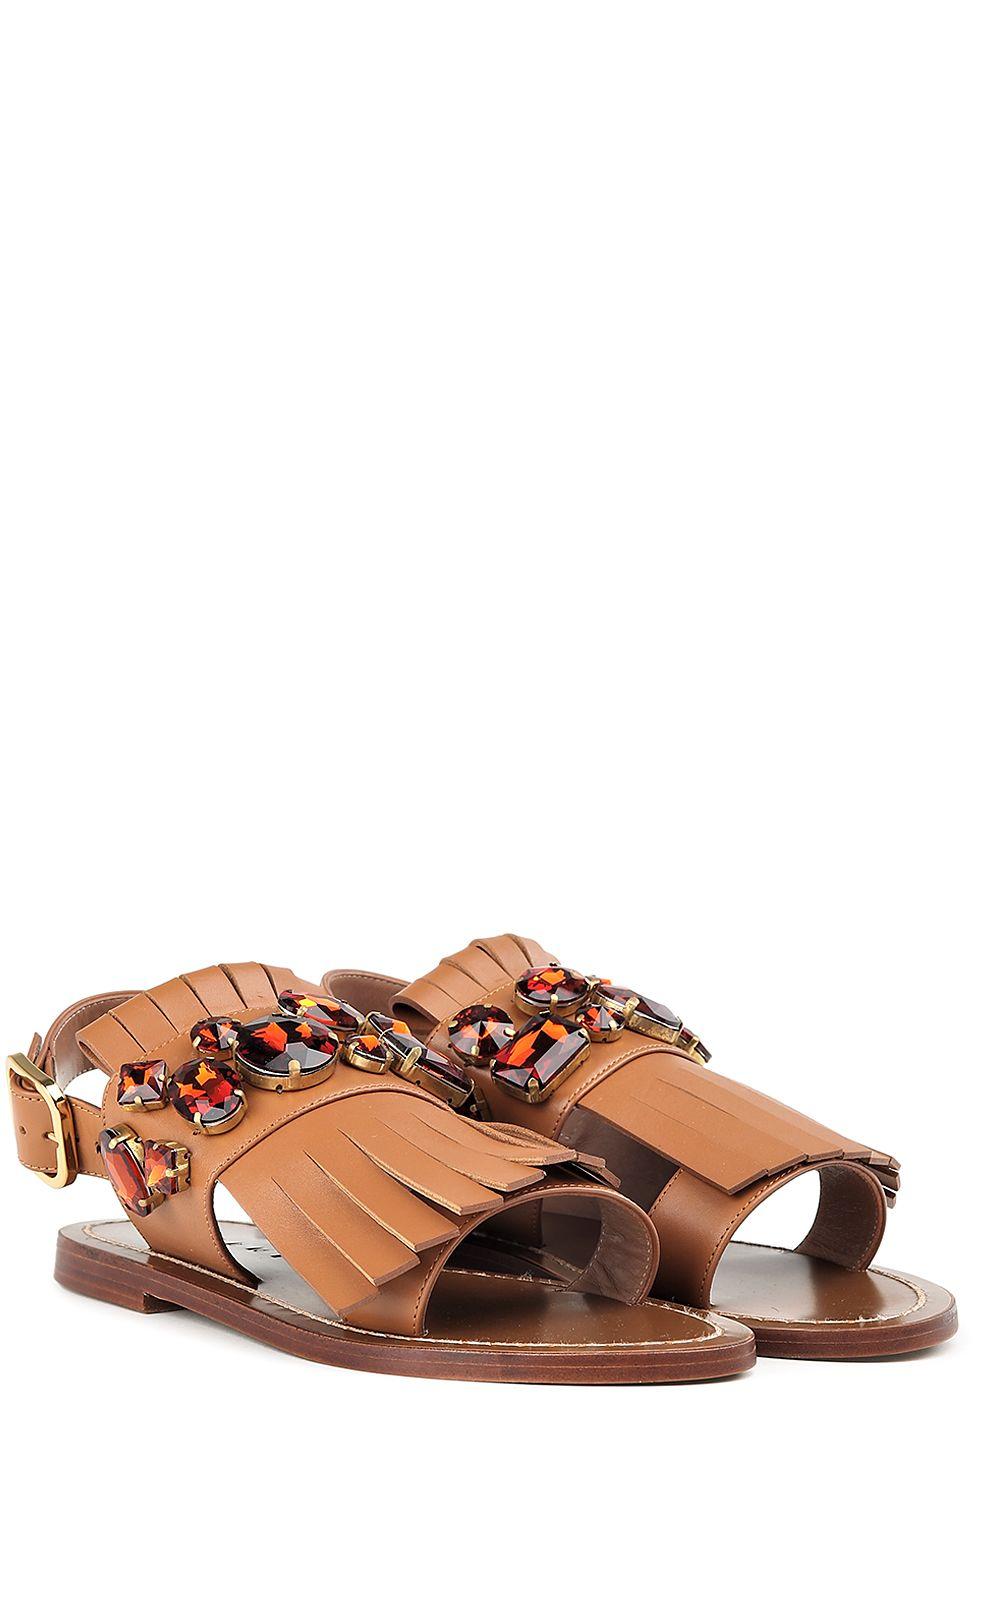 Marni Embellished Leather Flat Sandals